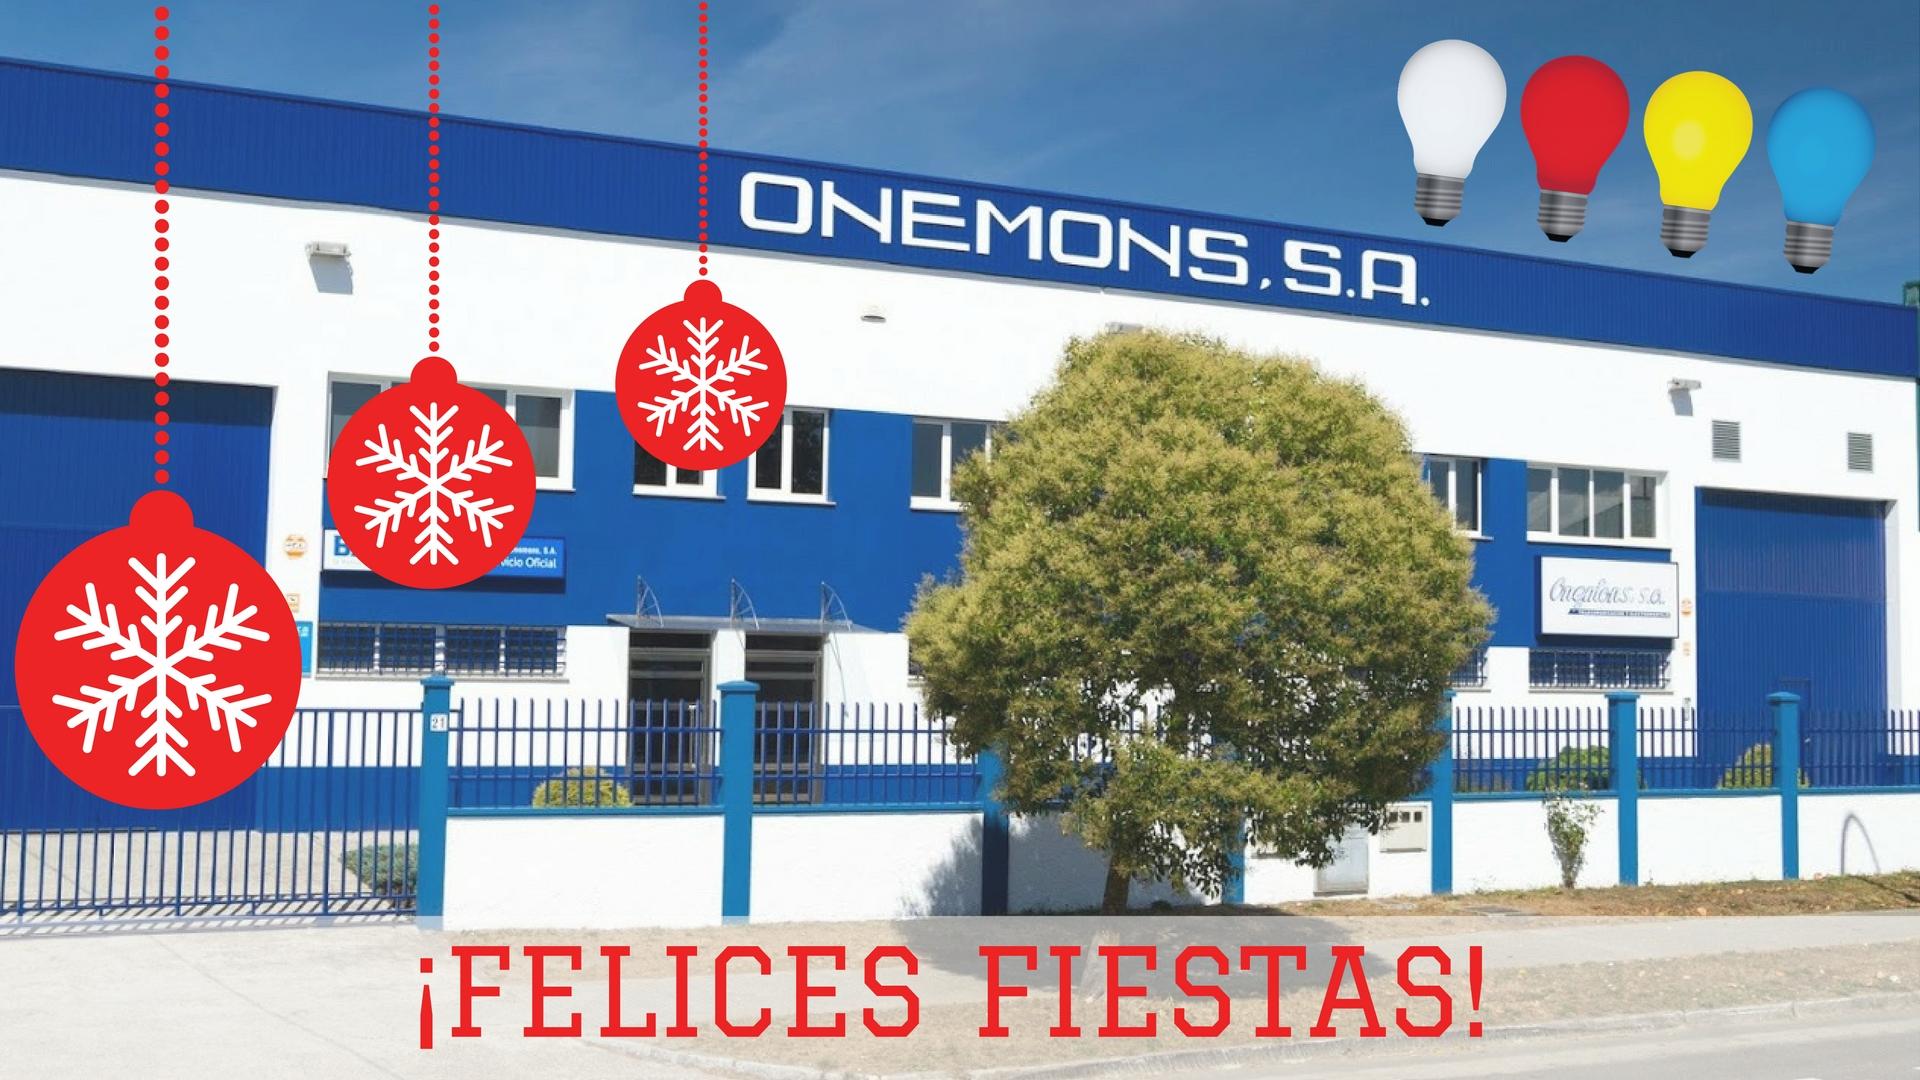 onemons-1920-definitiva